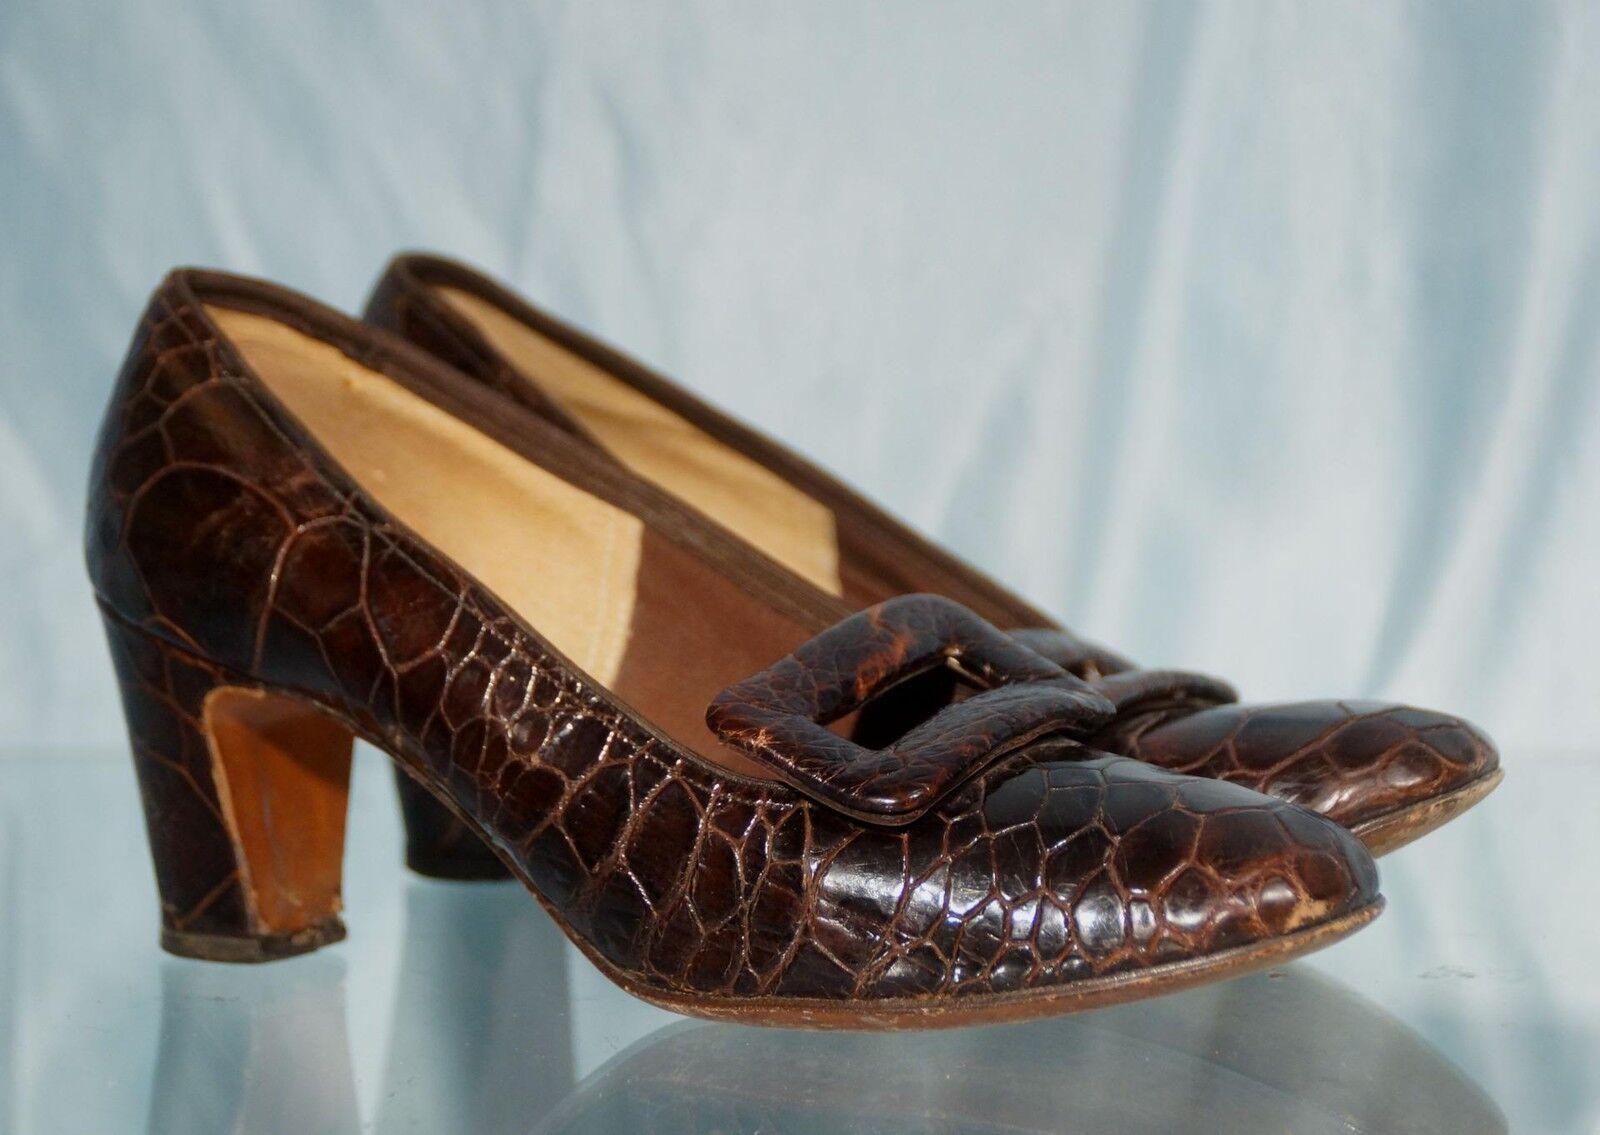 Vintage 1950s Buckle Dark braun Crocodile AFFINITI Buckle 1950s Pumps Sz 6B 9d2b85